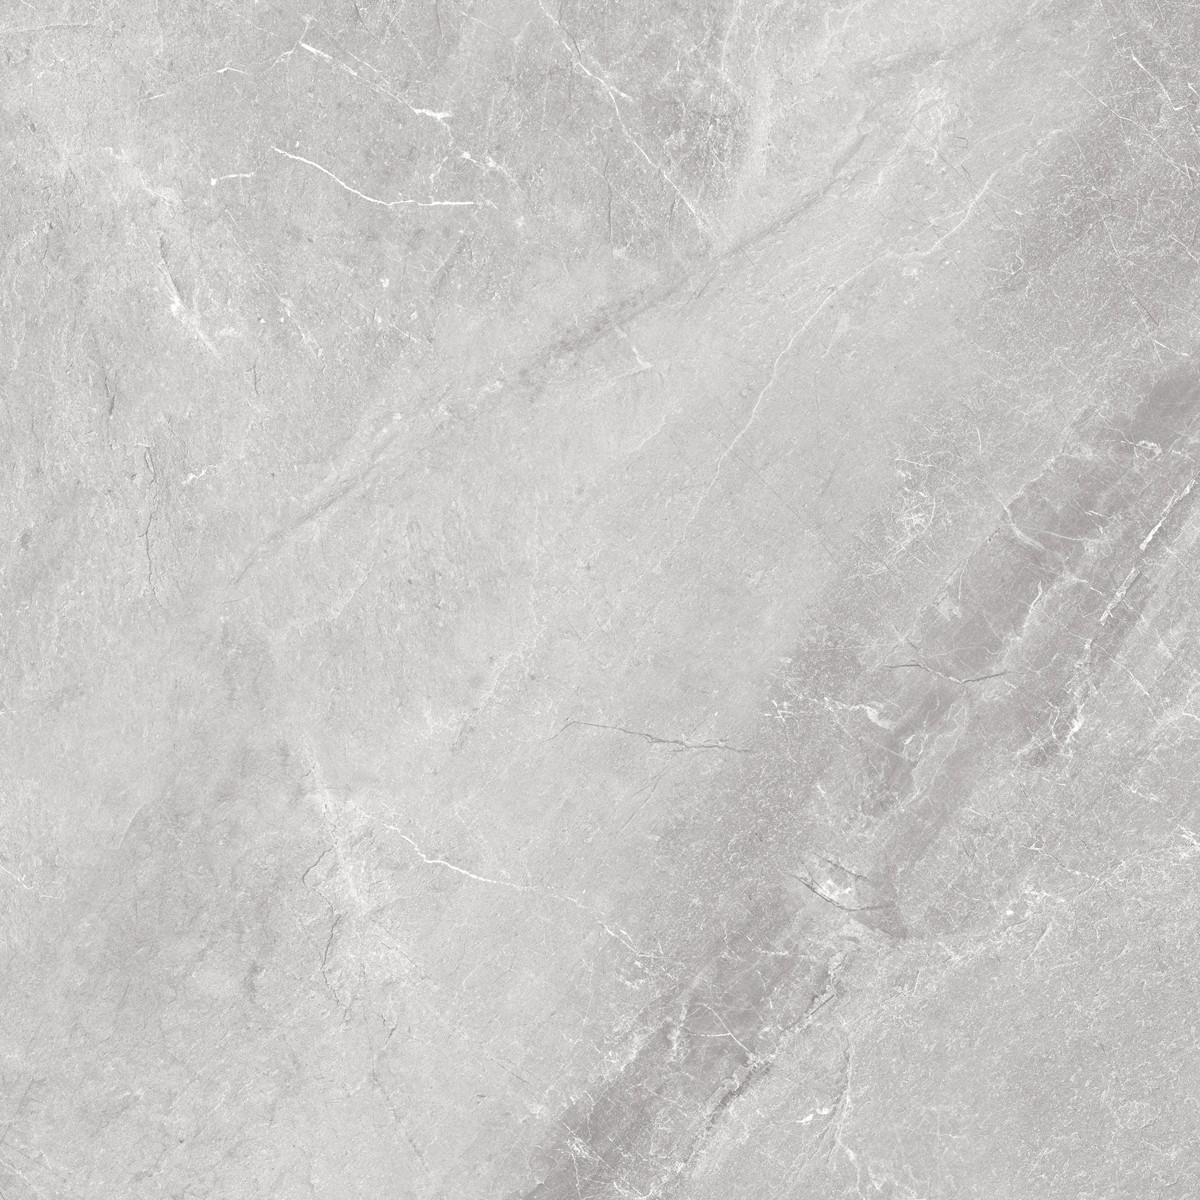 Płytka naturalna rekt. Nowa Gala Tioga  59,7 x 59,7 cm szary TG 12